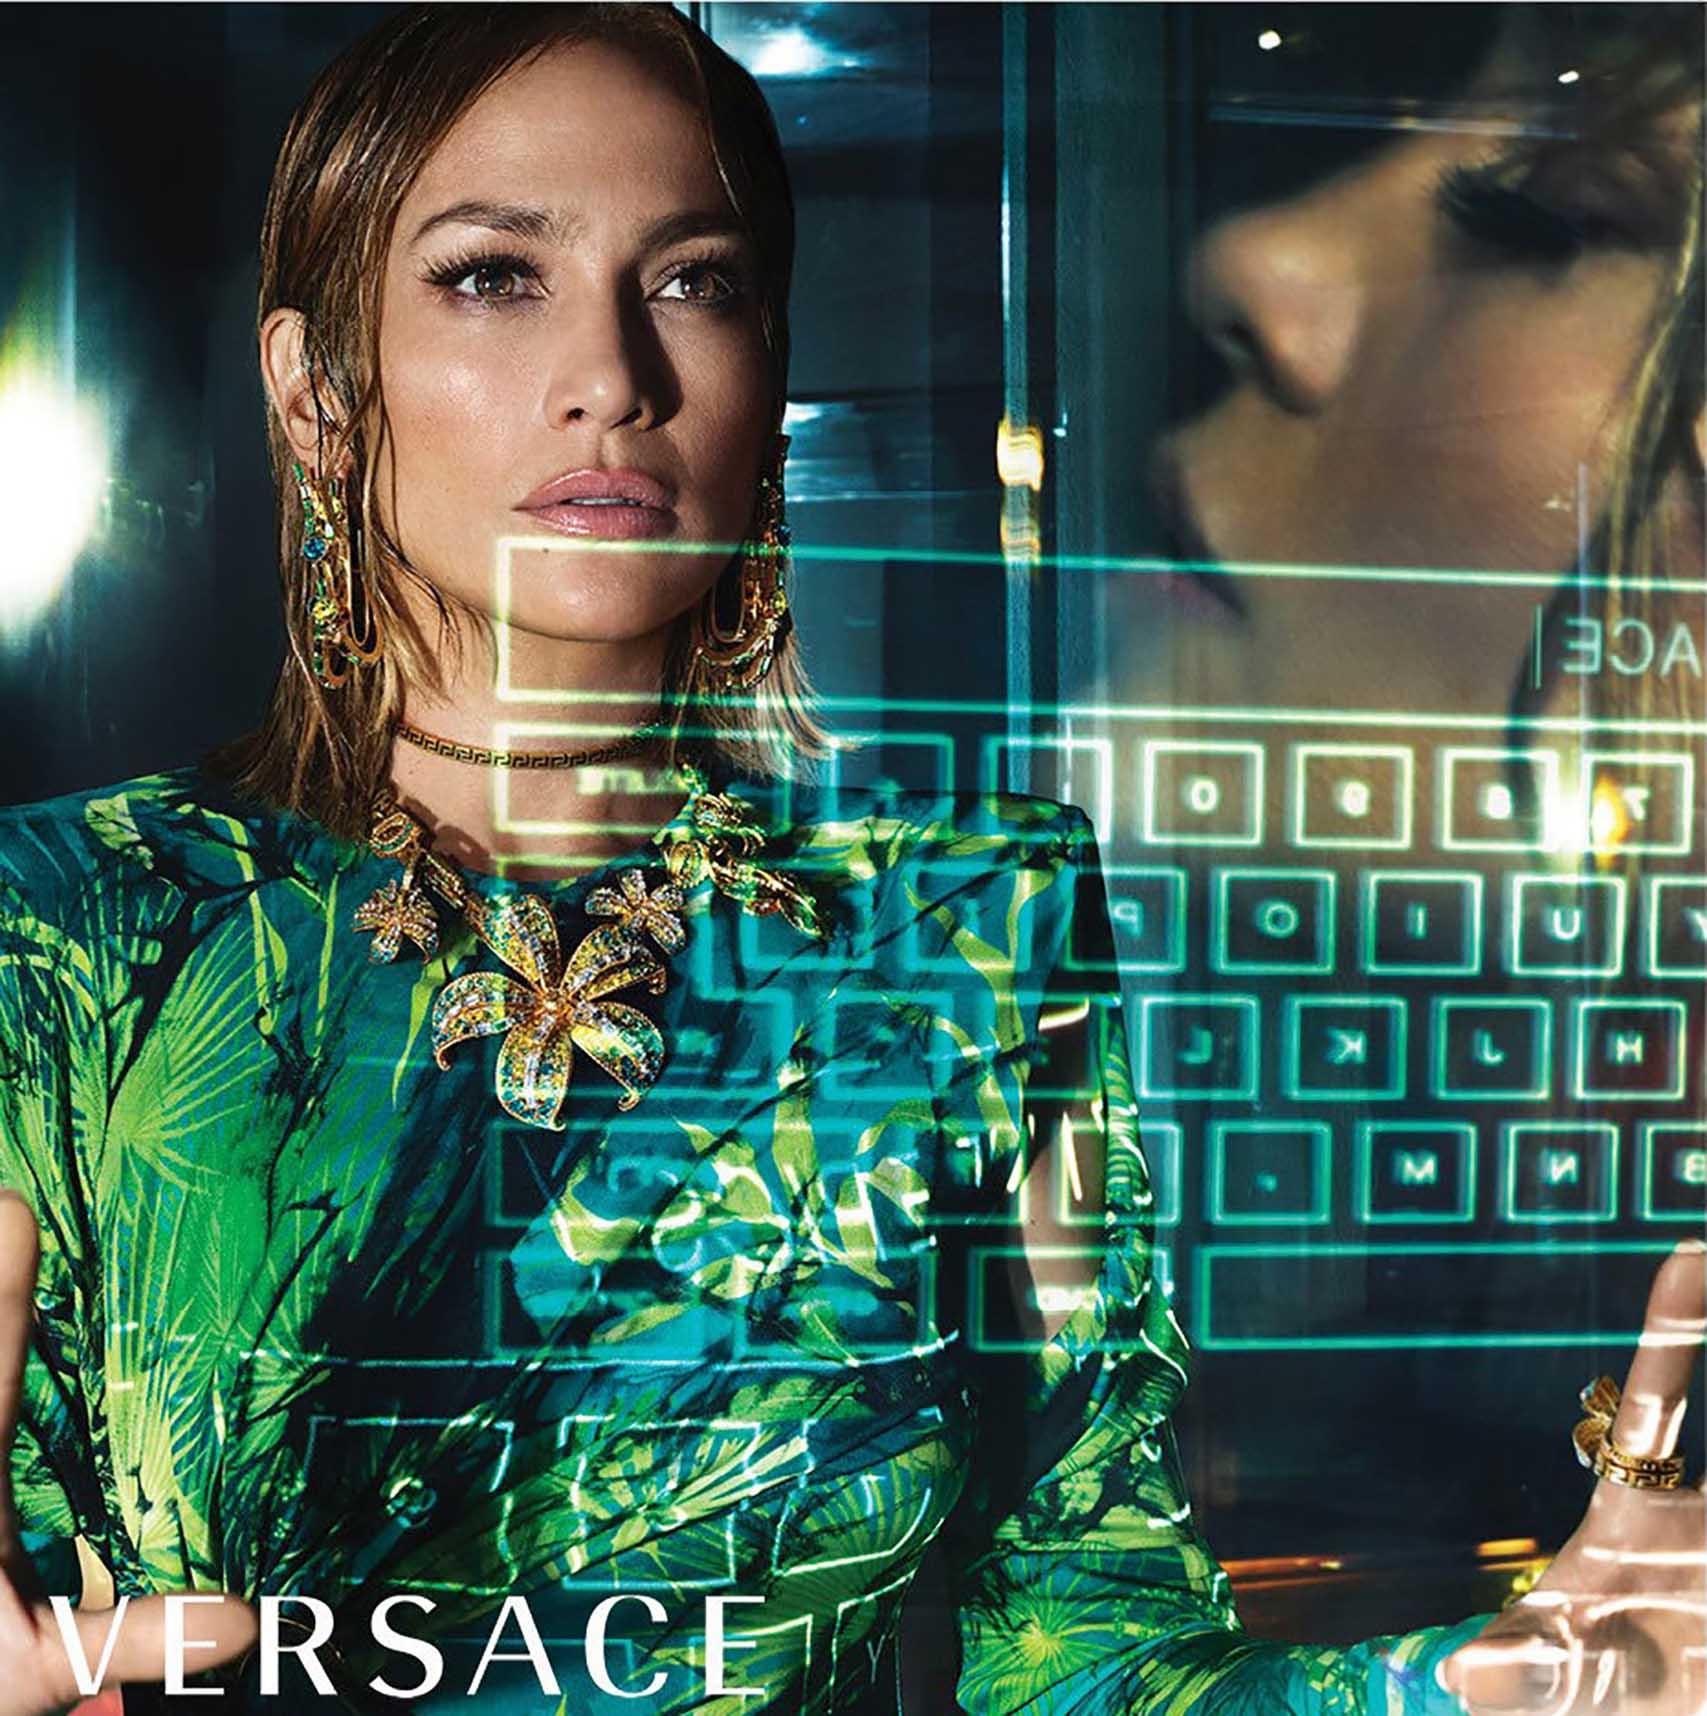 Versace_מגזין אופנה